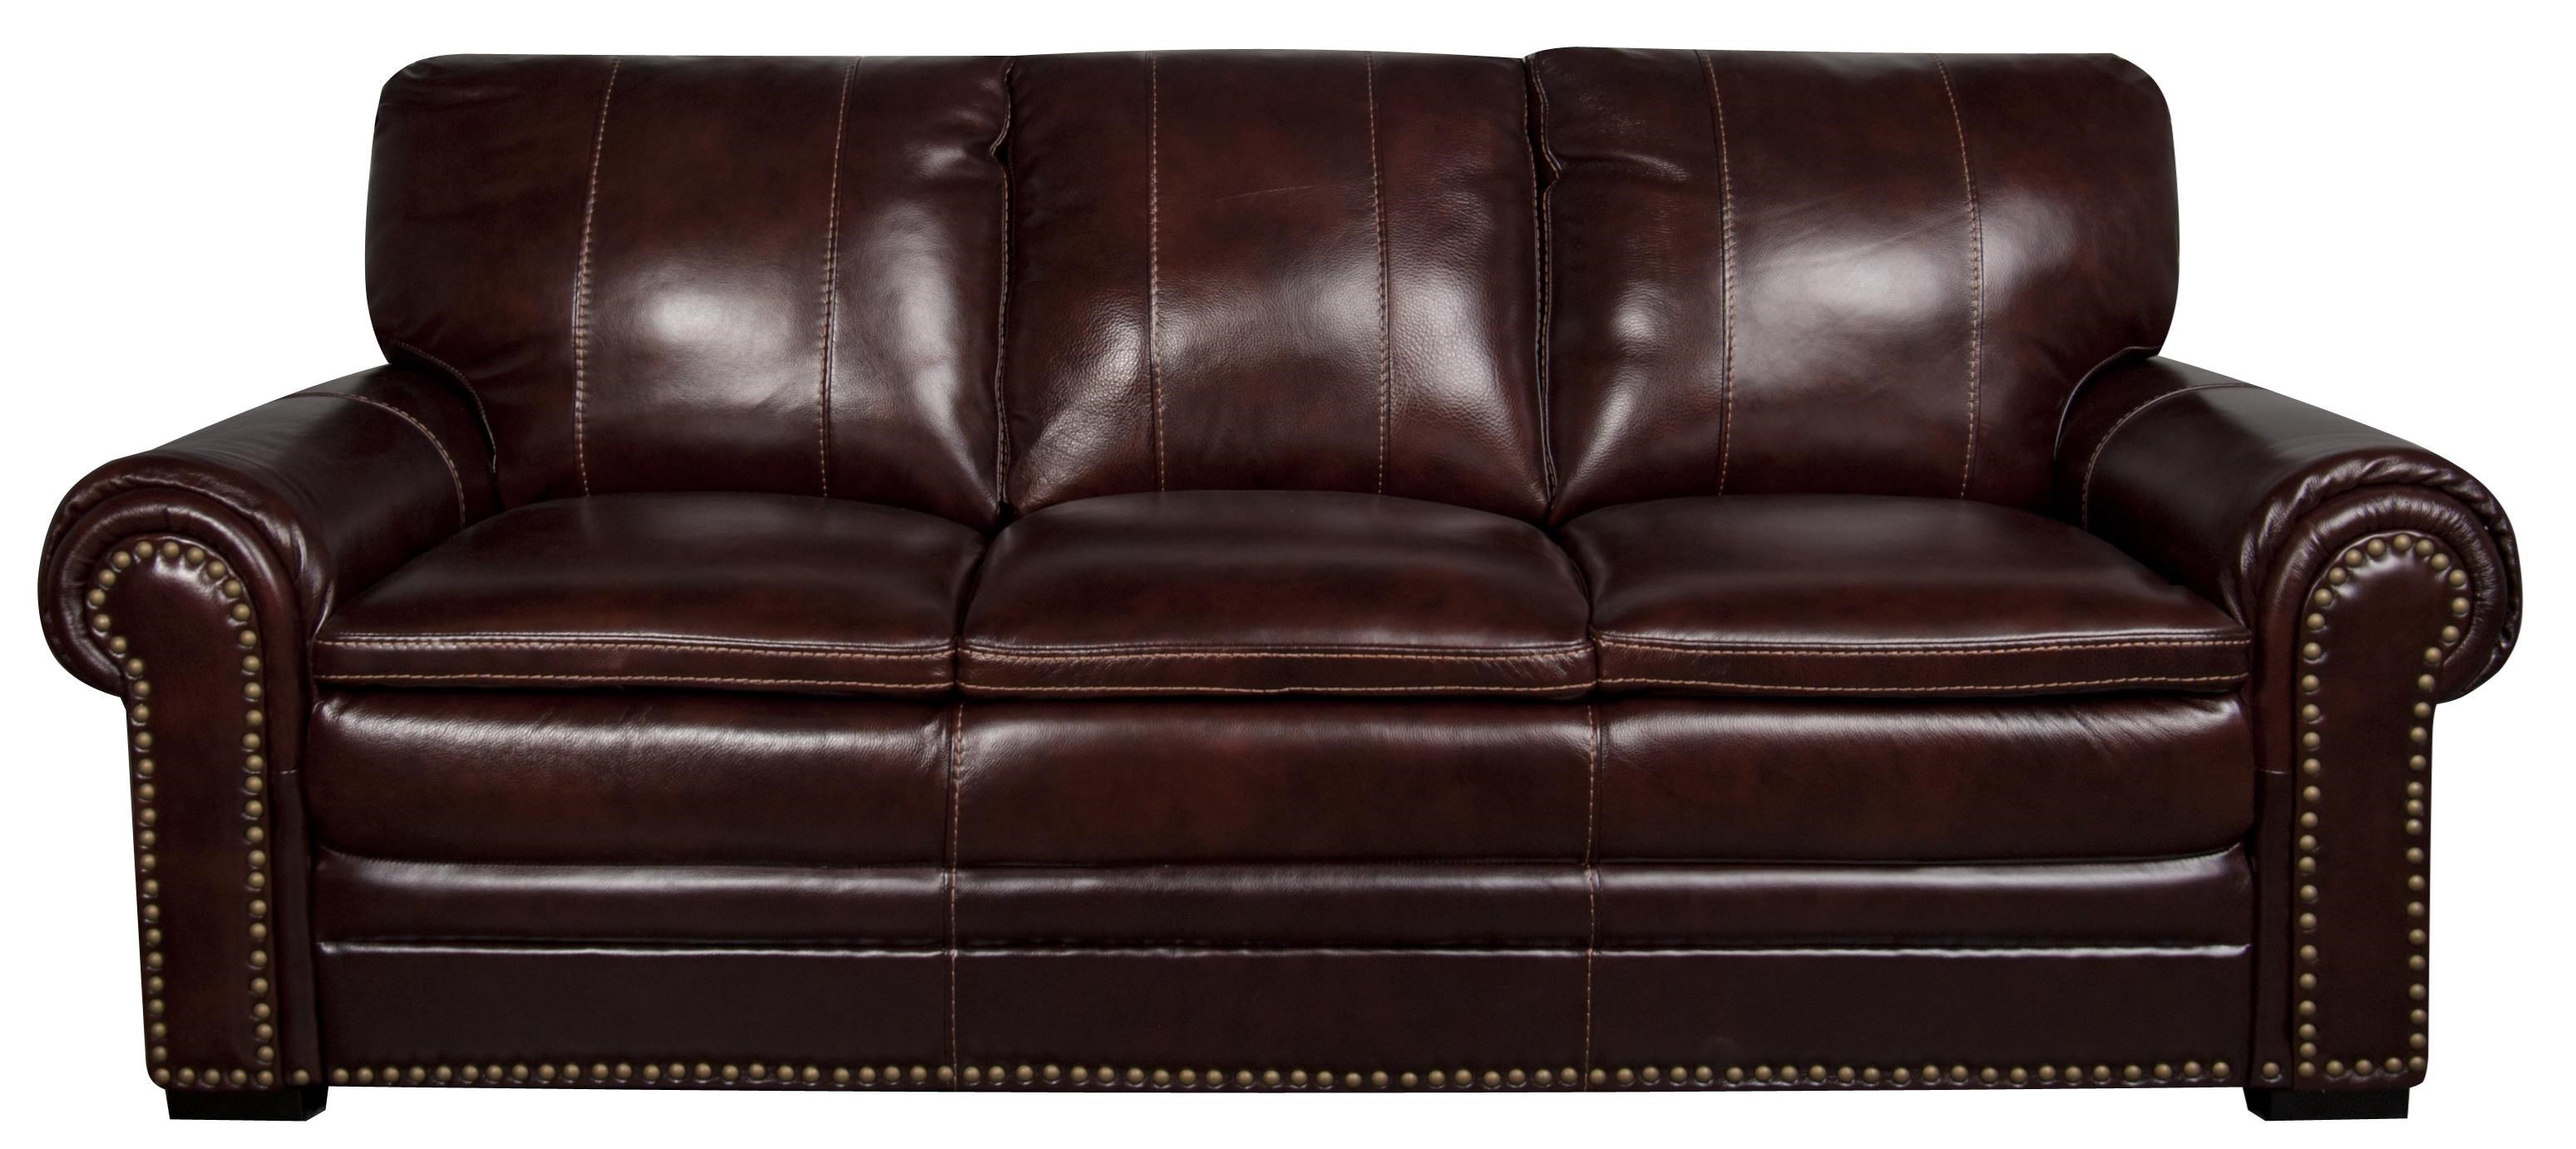 Morris Home Elwood Elwood Leather-Match* Sofa - Item Number: 558703707